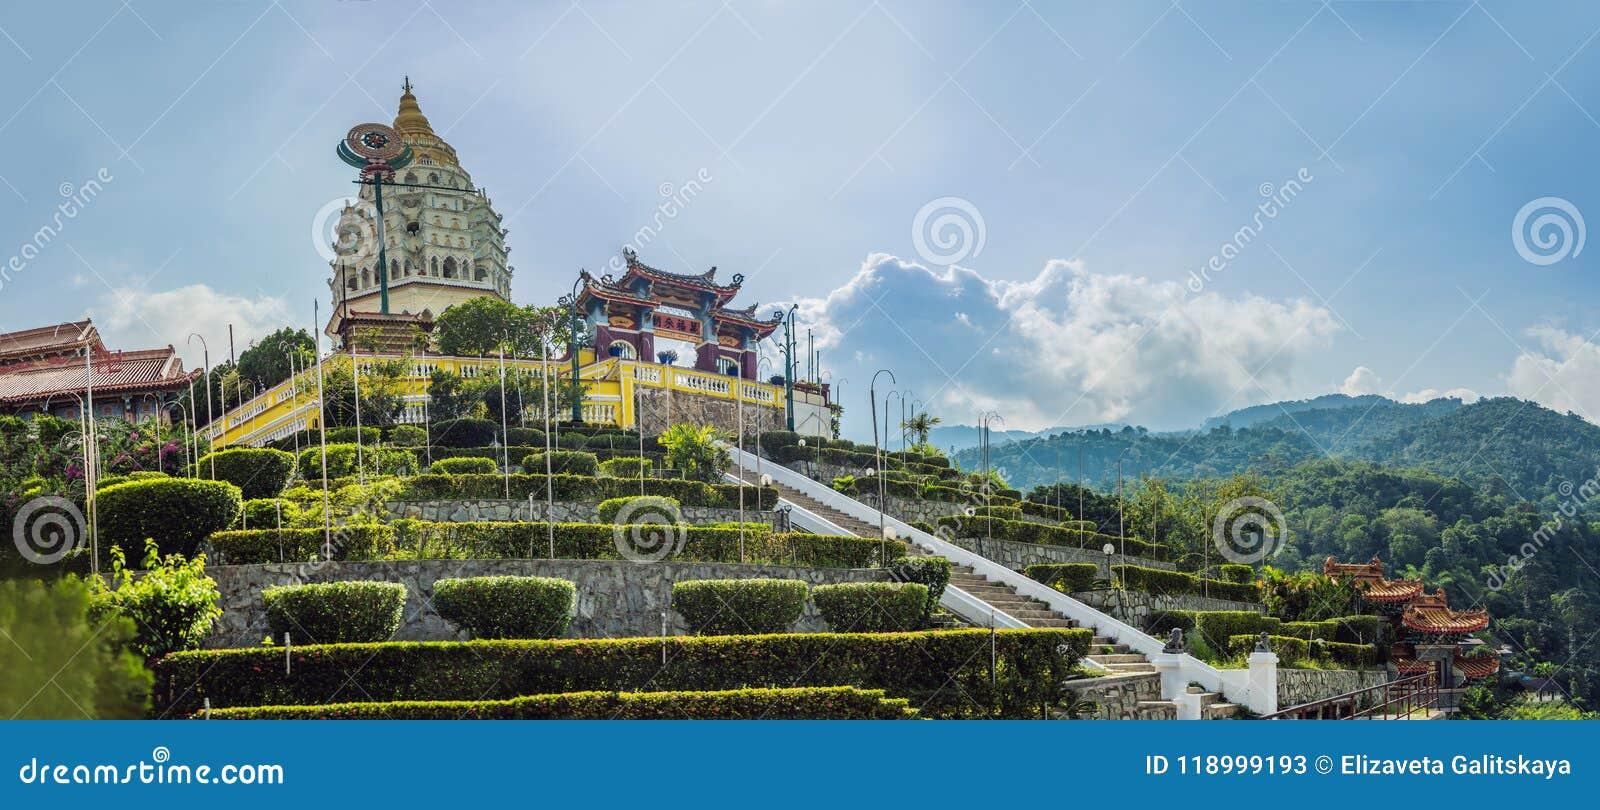 Buddistisk tempel Kek Lok Si i Penang, Malaysia, Georgetown